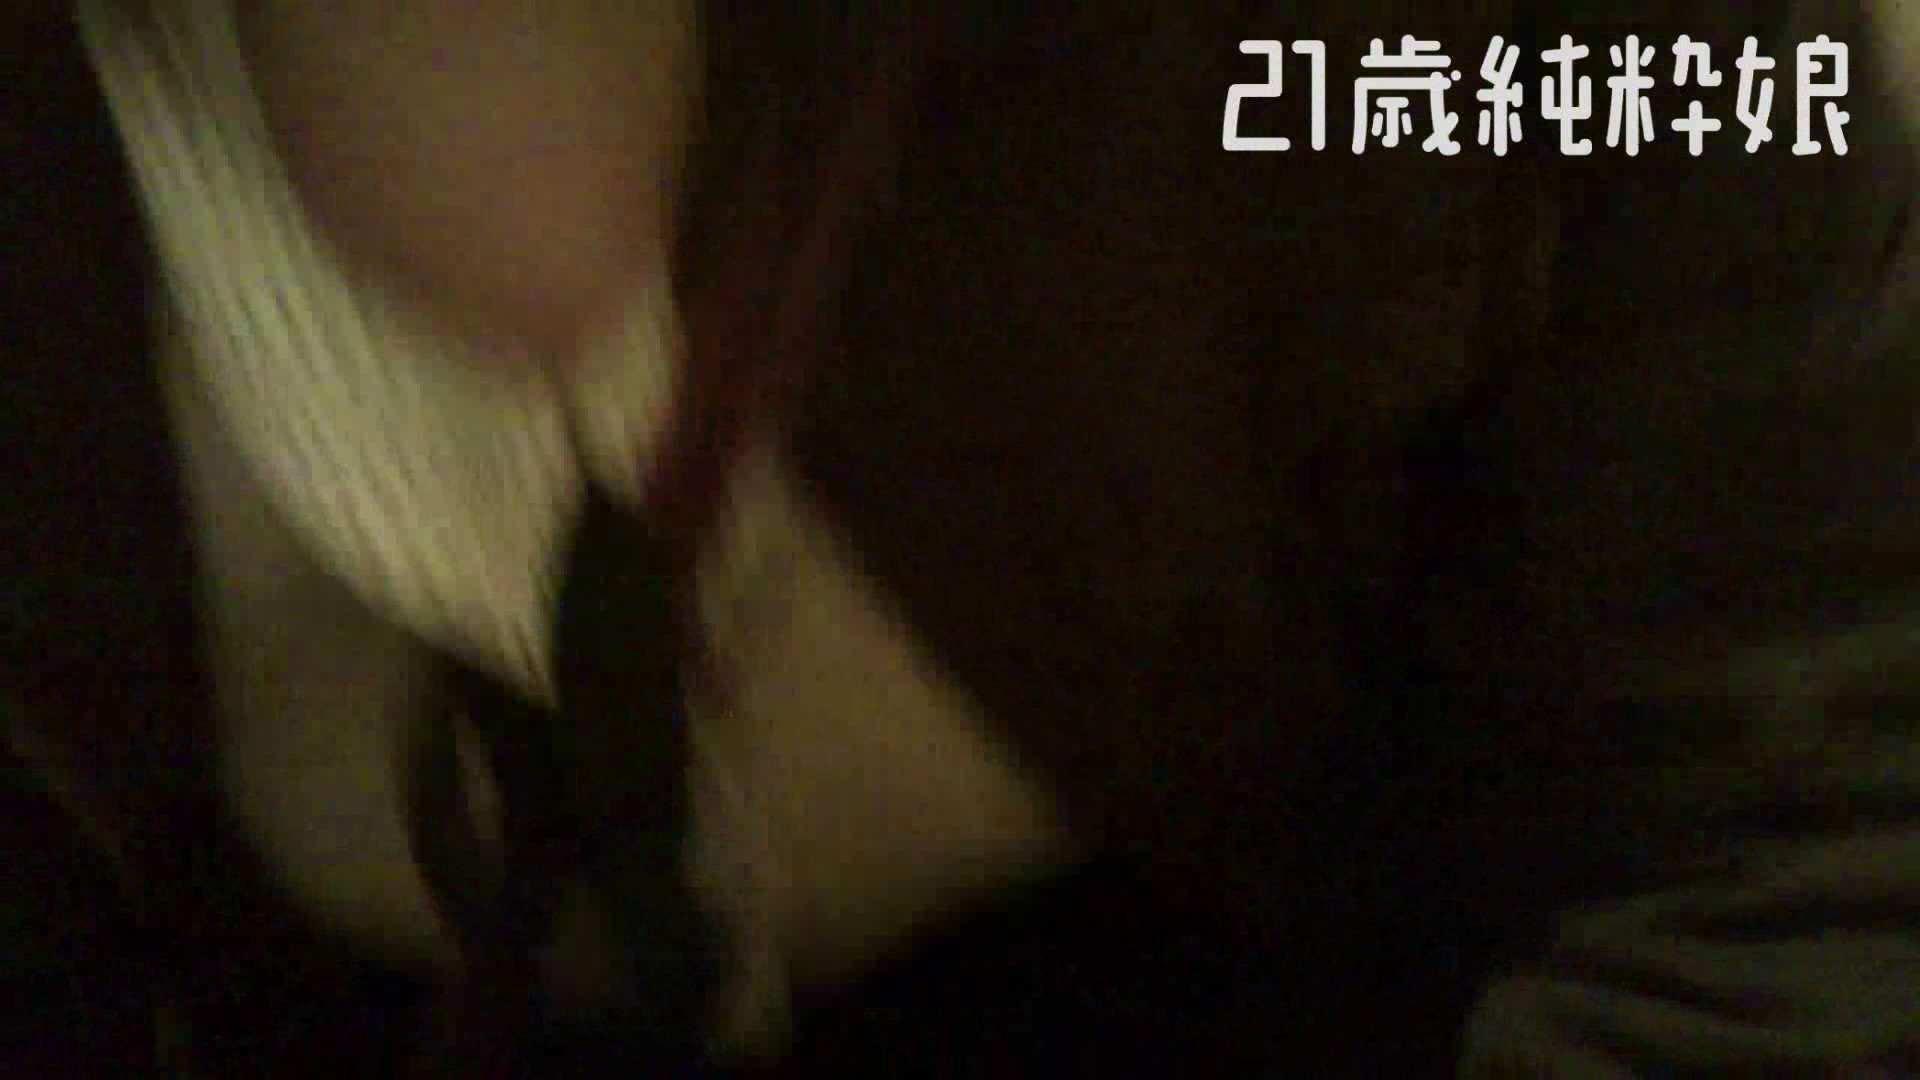 Gカップ21歳純粋嬢第2弾Vol.5 OLのエロ生活 ヌード画像 108連発 77